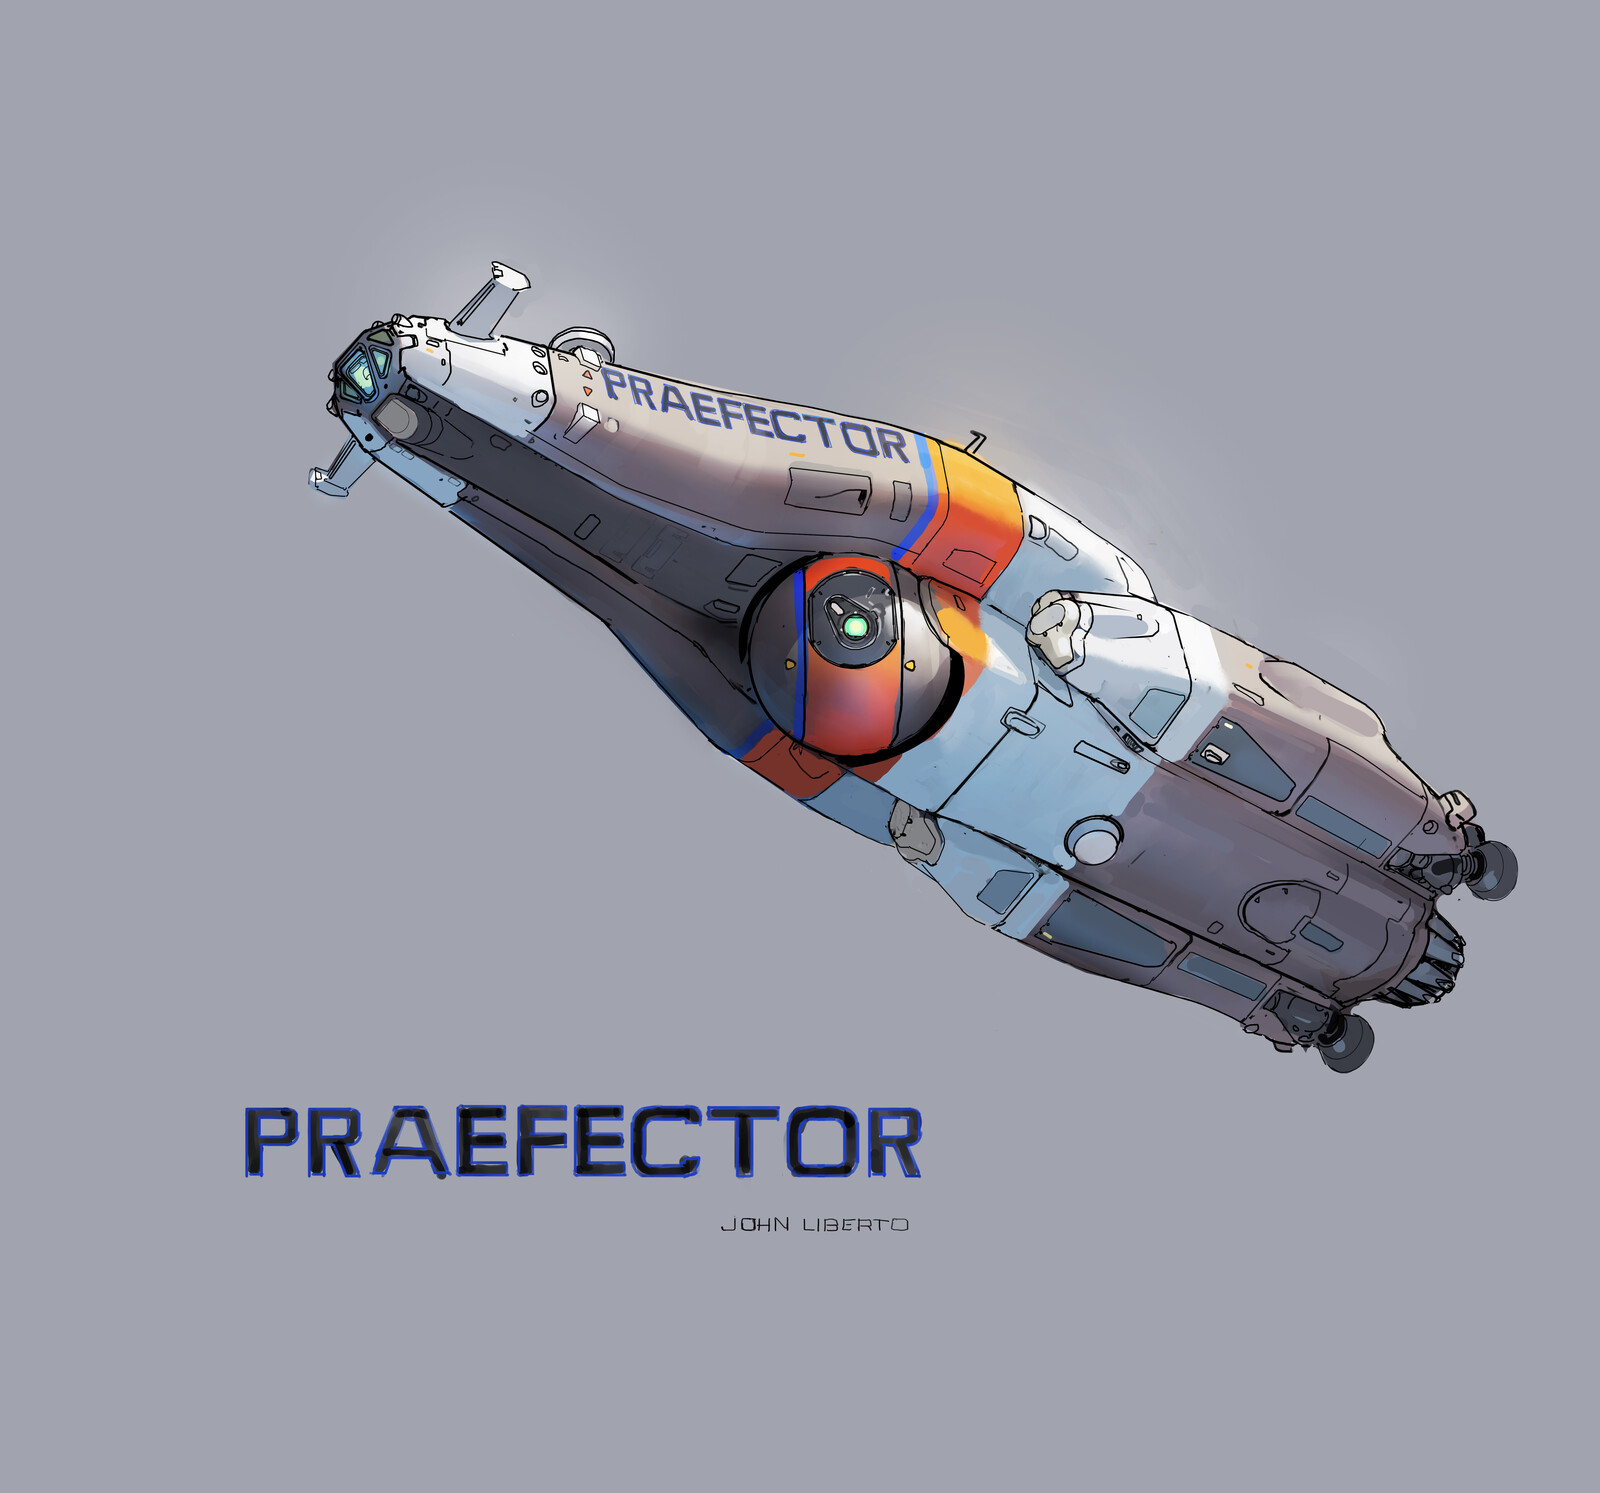 Praefector